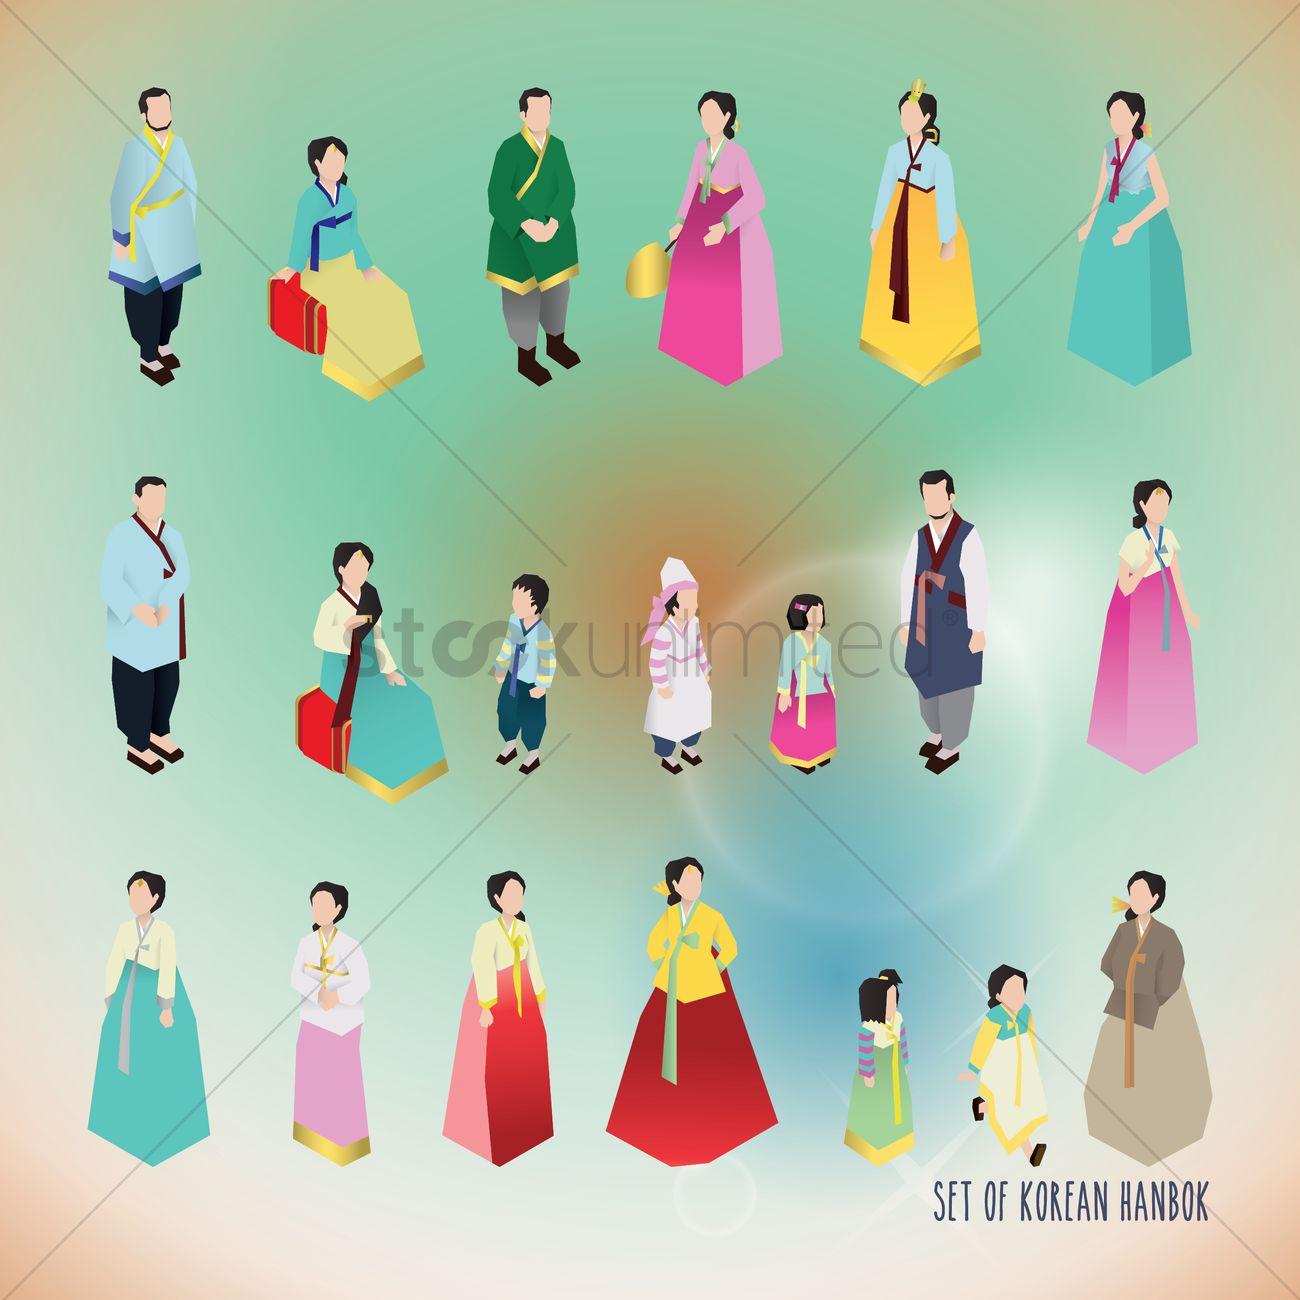 set of korean hanbok icons vector image